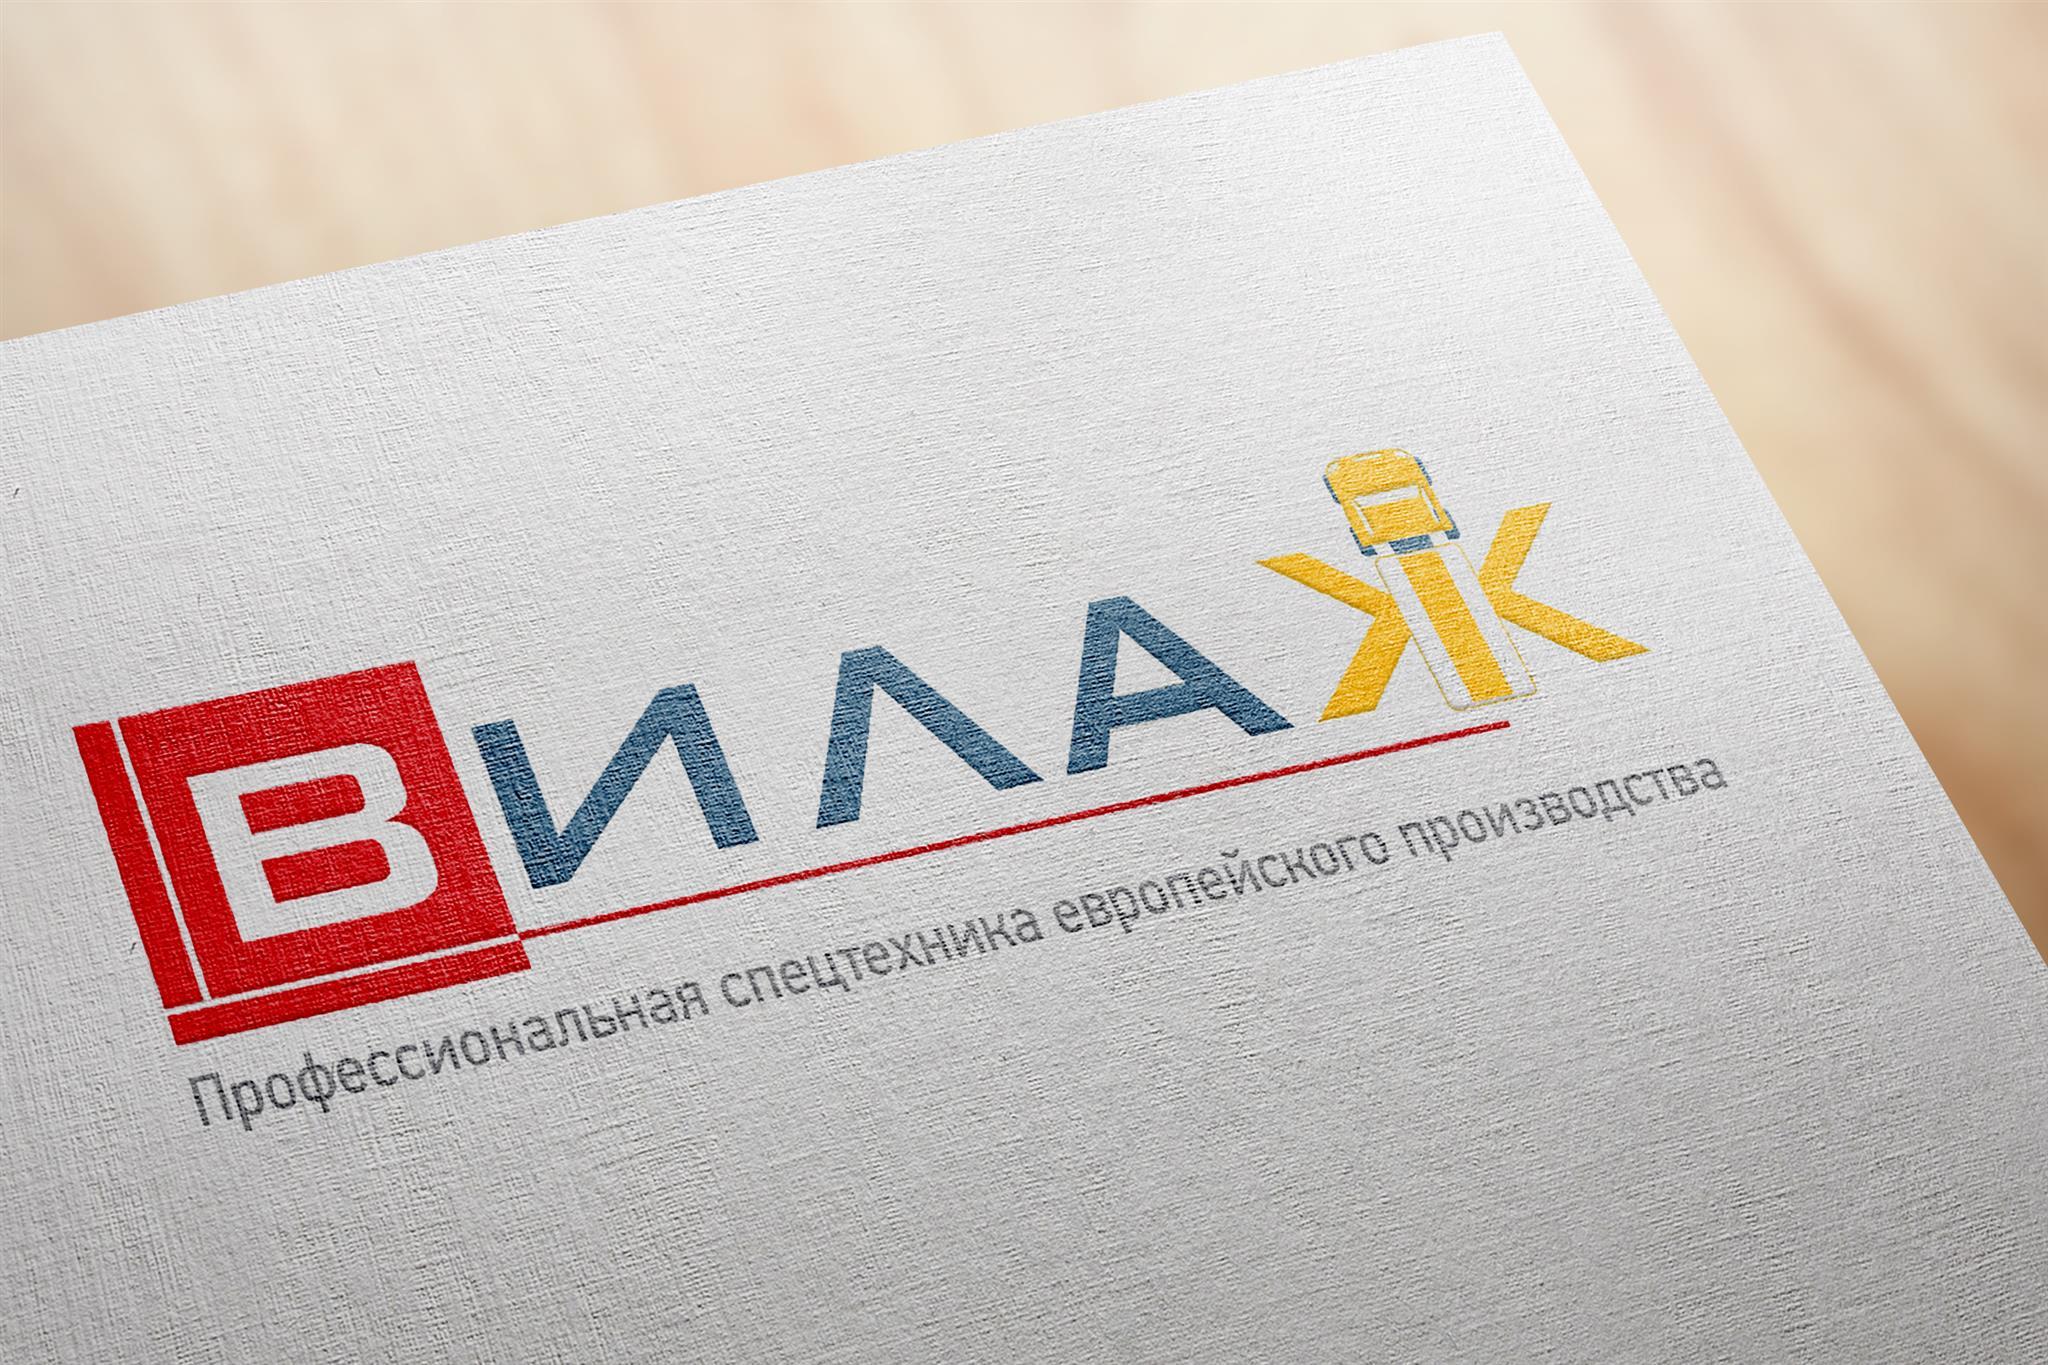 Логотип для компании по аренде спец.техники фото f_16059947bea2ecda.jpg